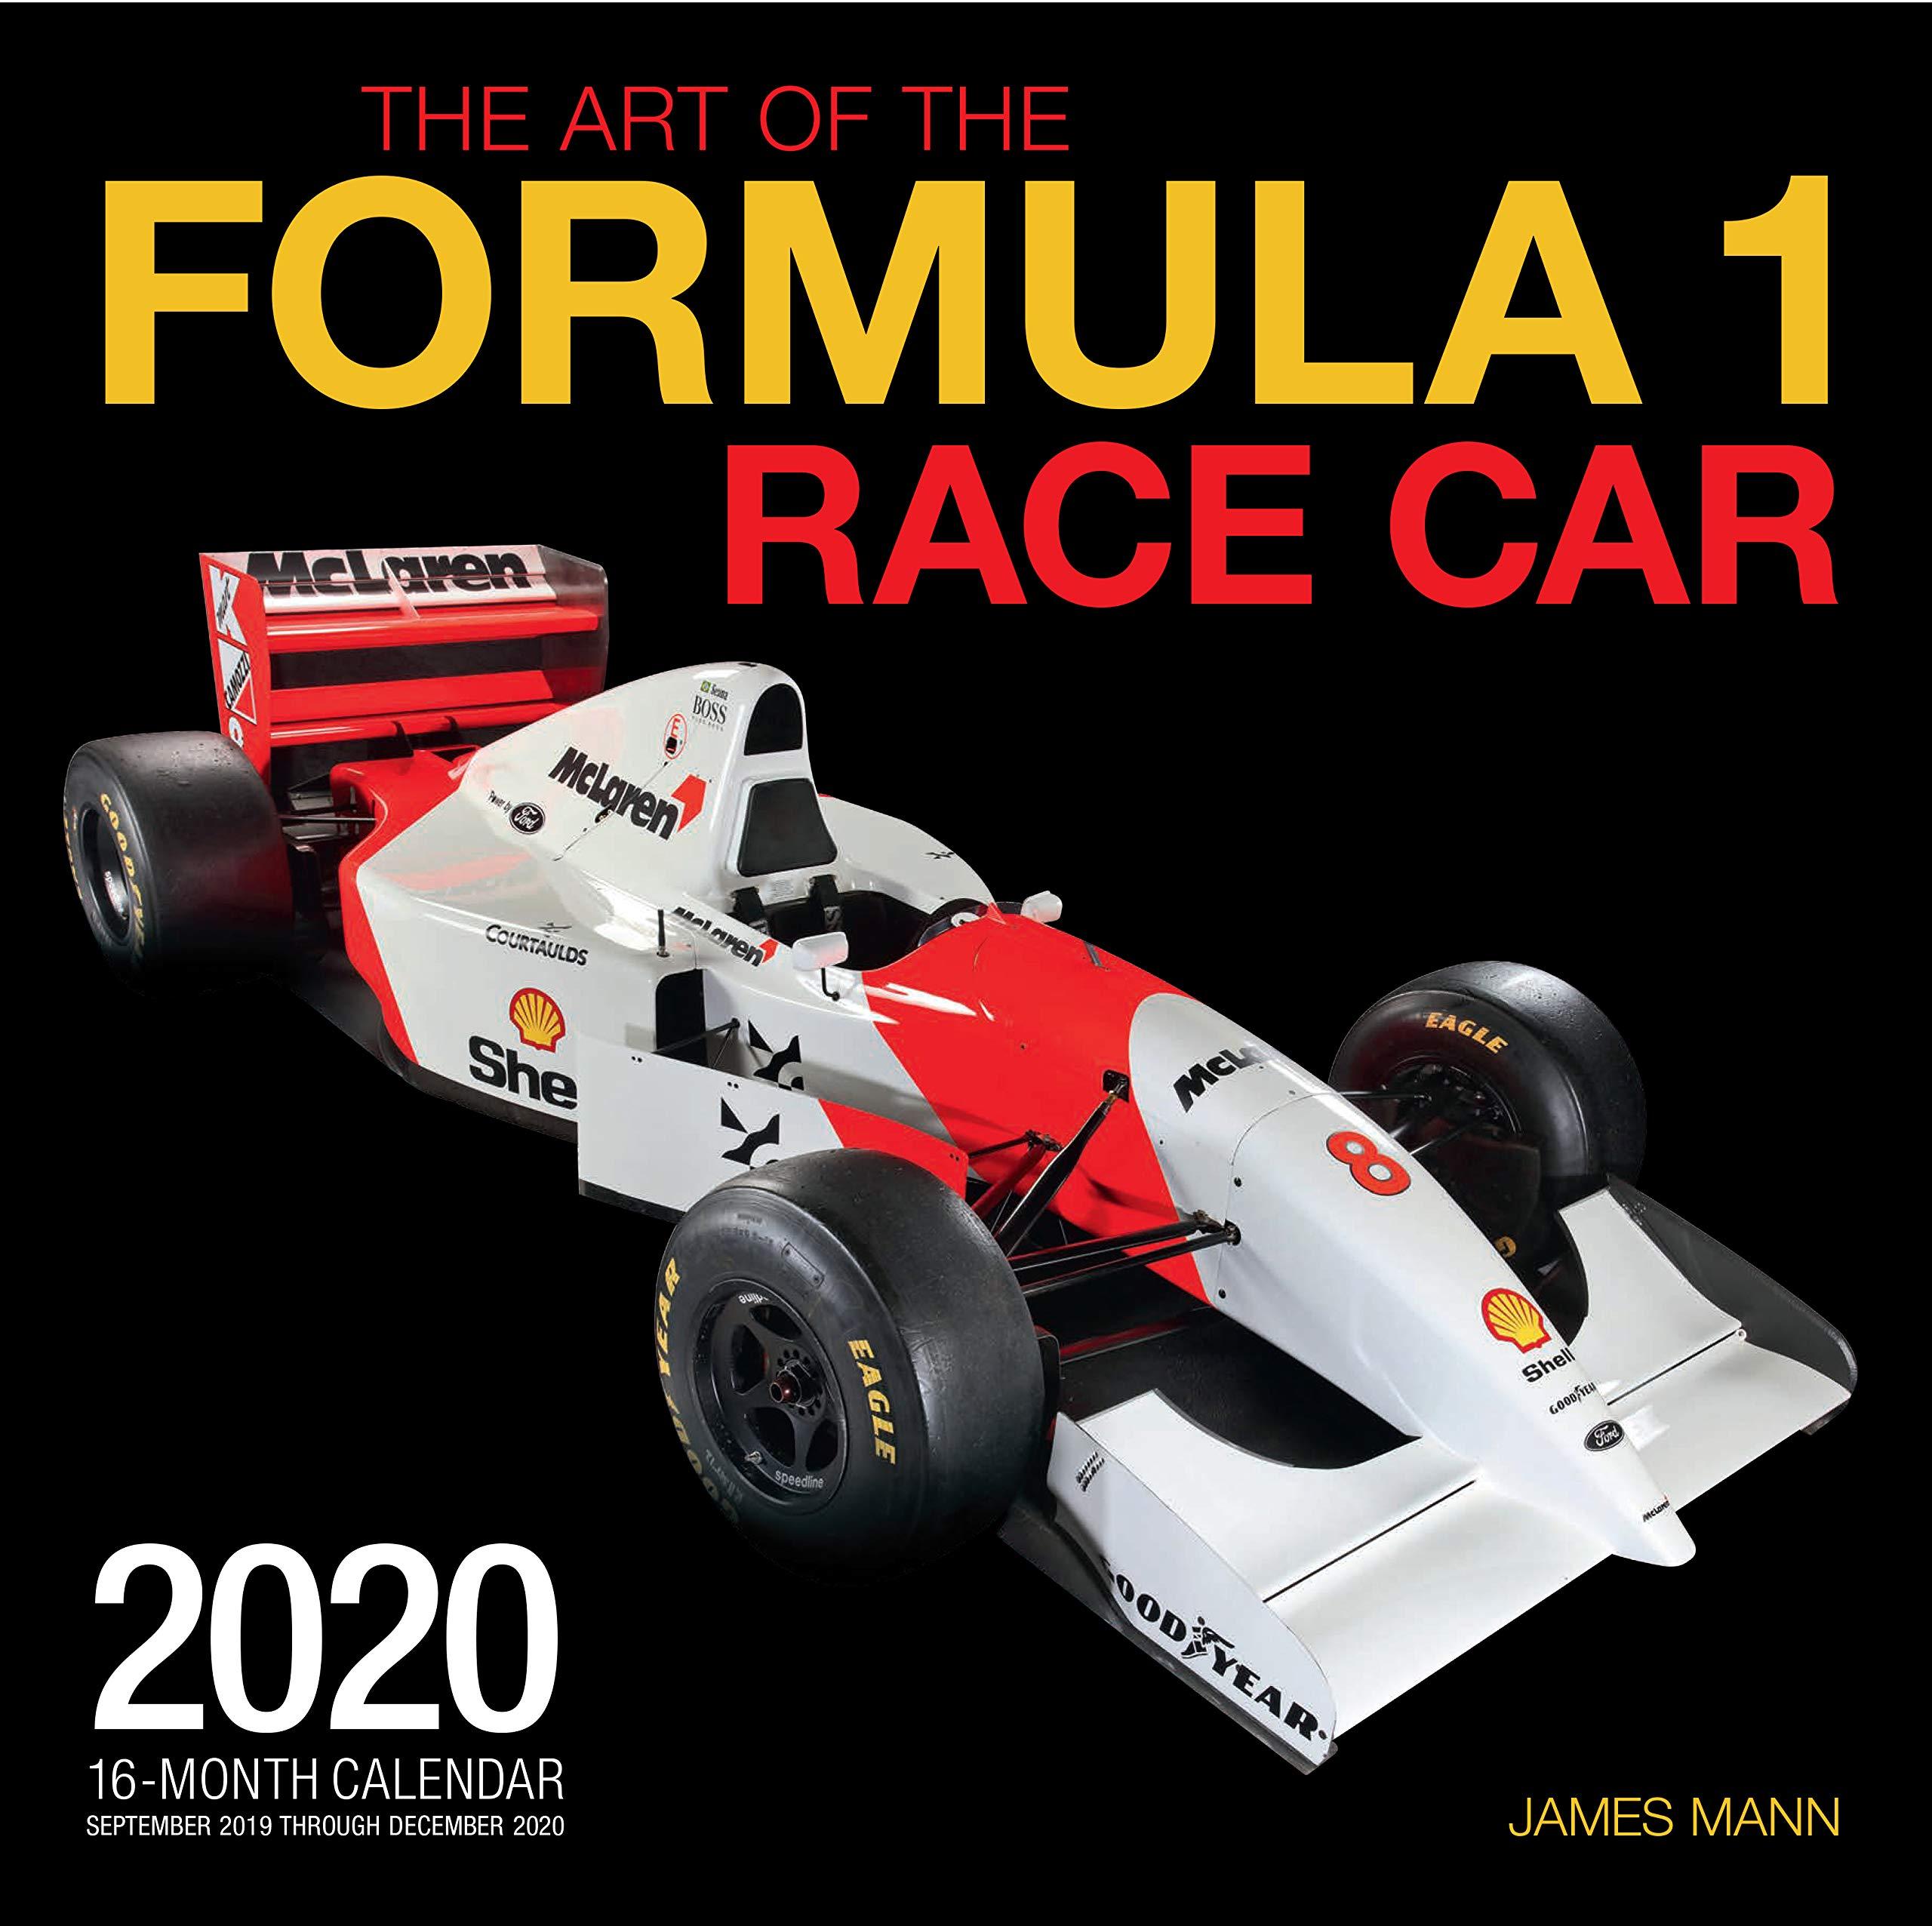 Amazon Com The Art Of The Formula 1 Race Car 2020 16 Month Calendar September 2019 Through December 2020 9780760365427 Editors Of Motorbooks Mann James Books